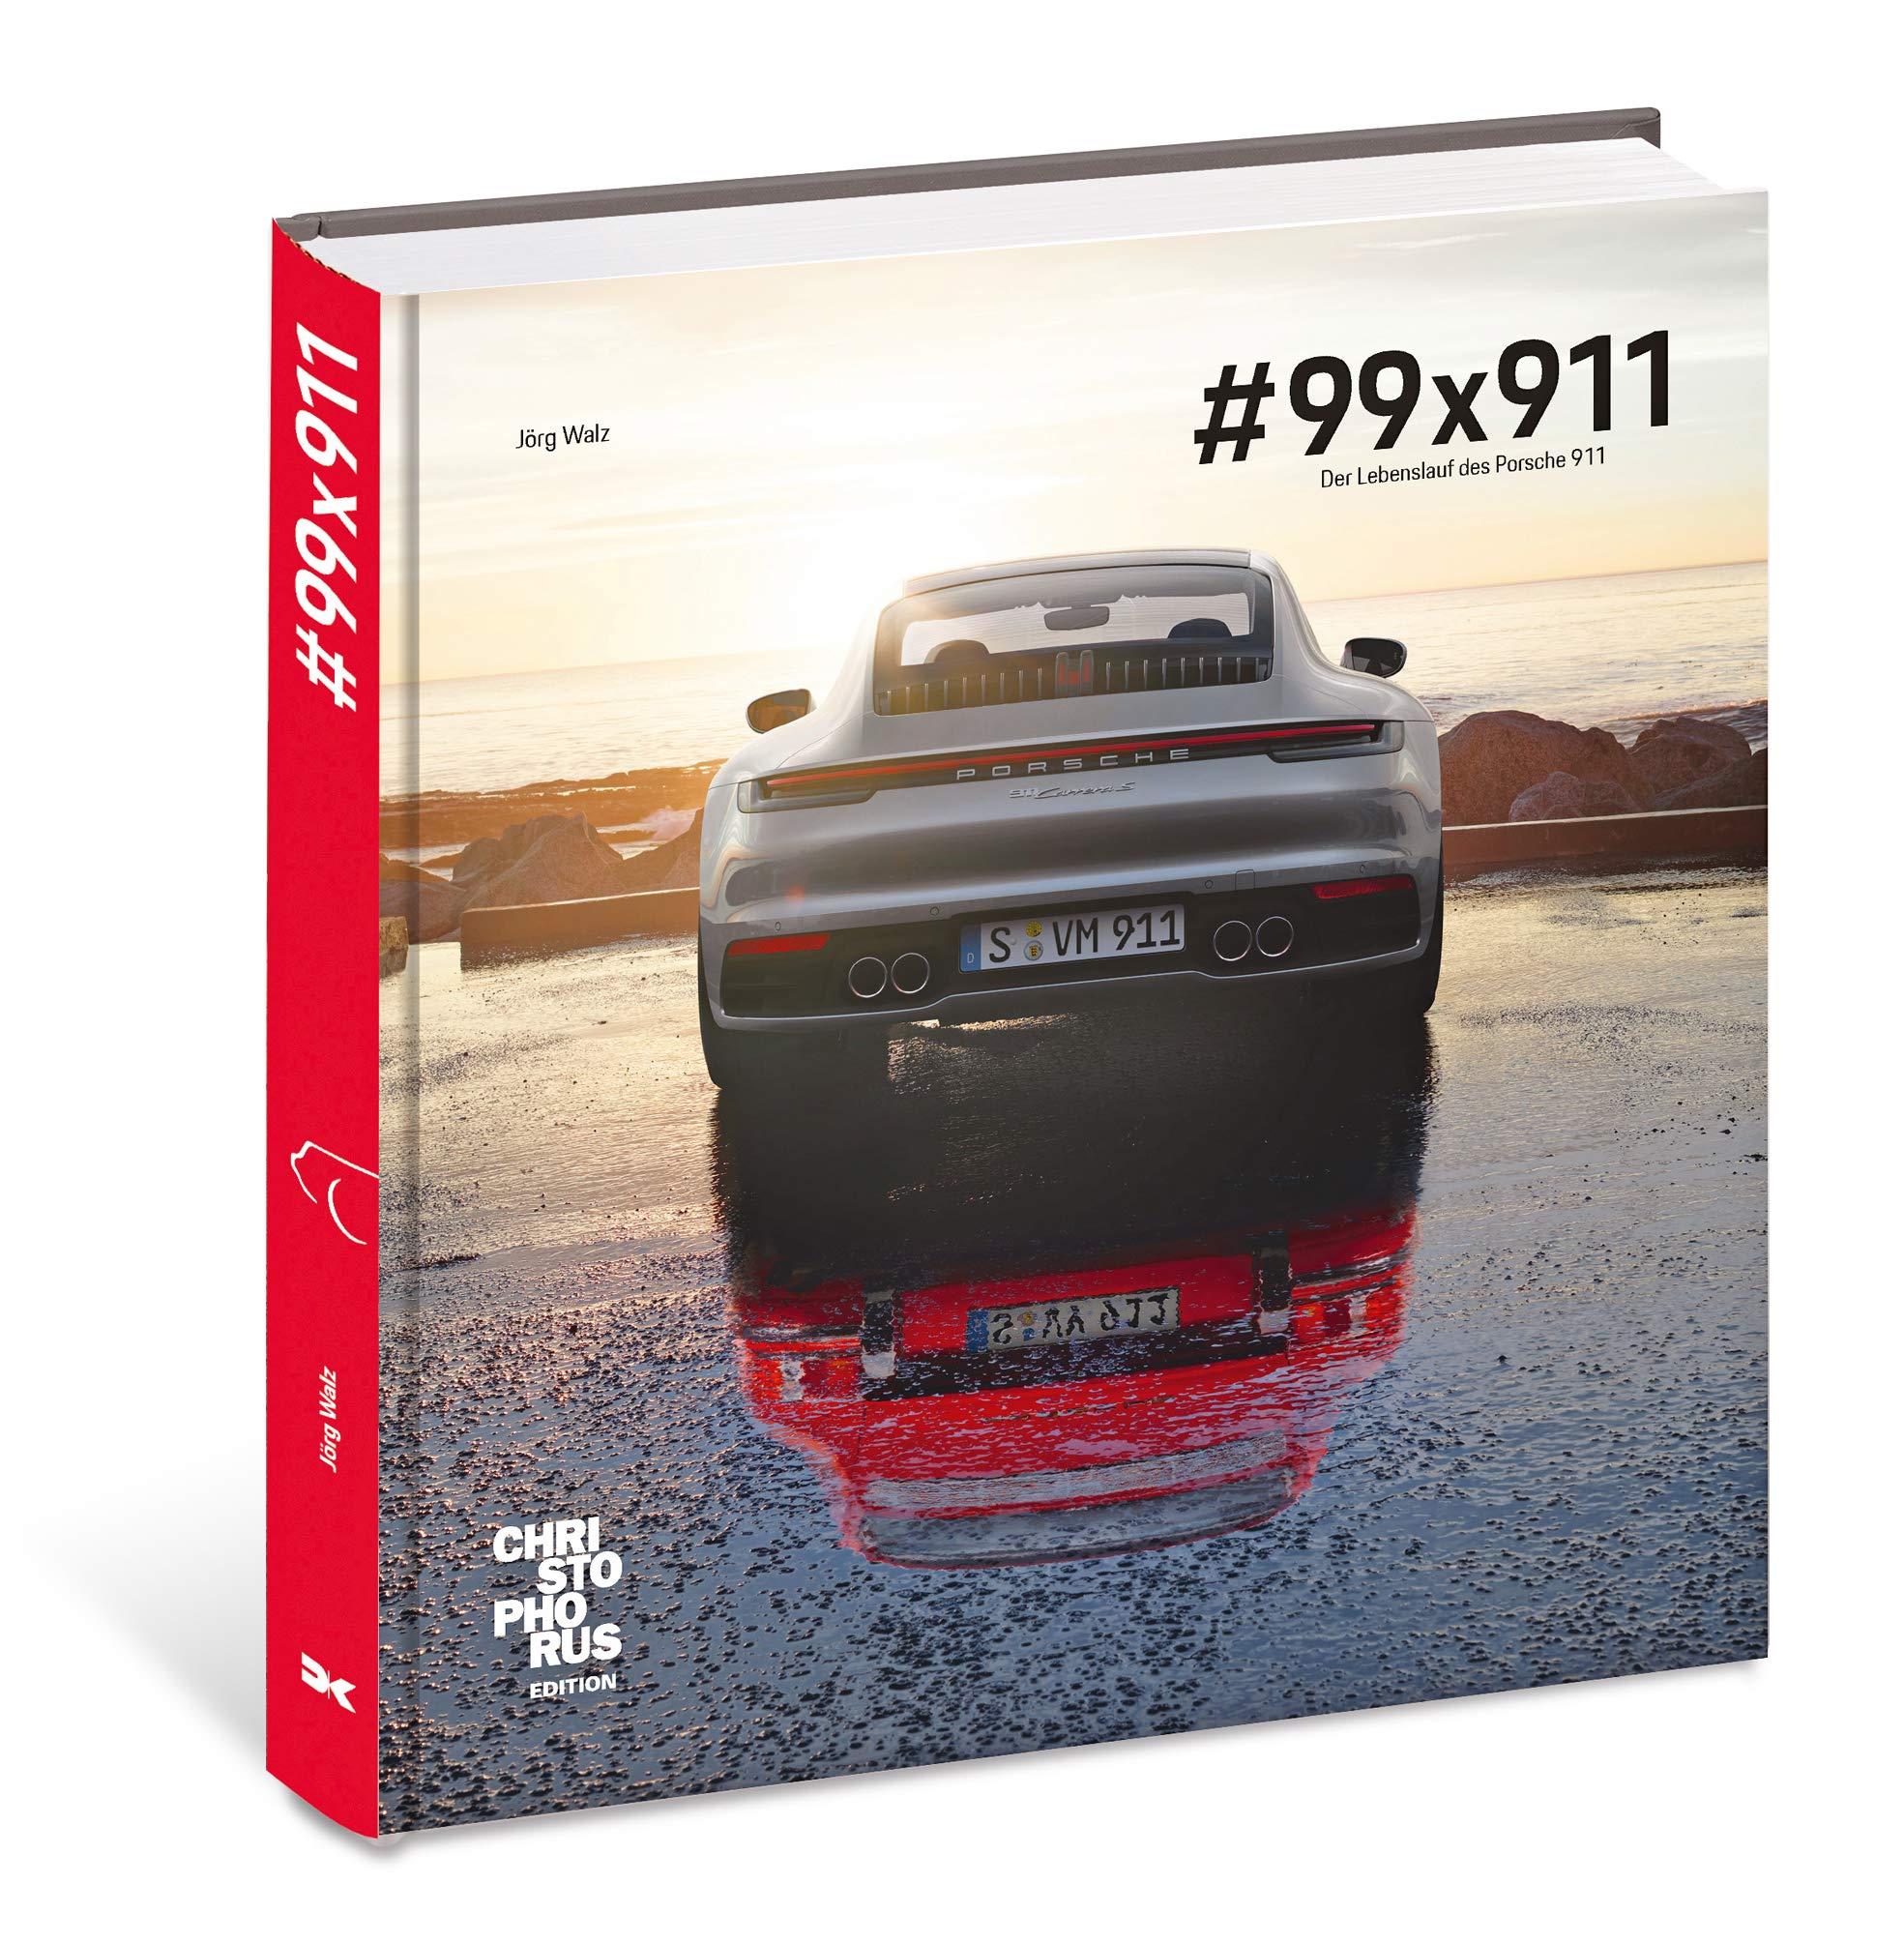 Car Miniatur Porsche 911 Carrera 4 Auto Miniatur Gebraucht Gebraucht Wie Neu